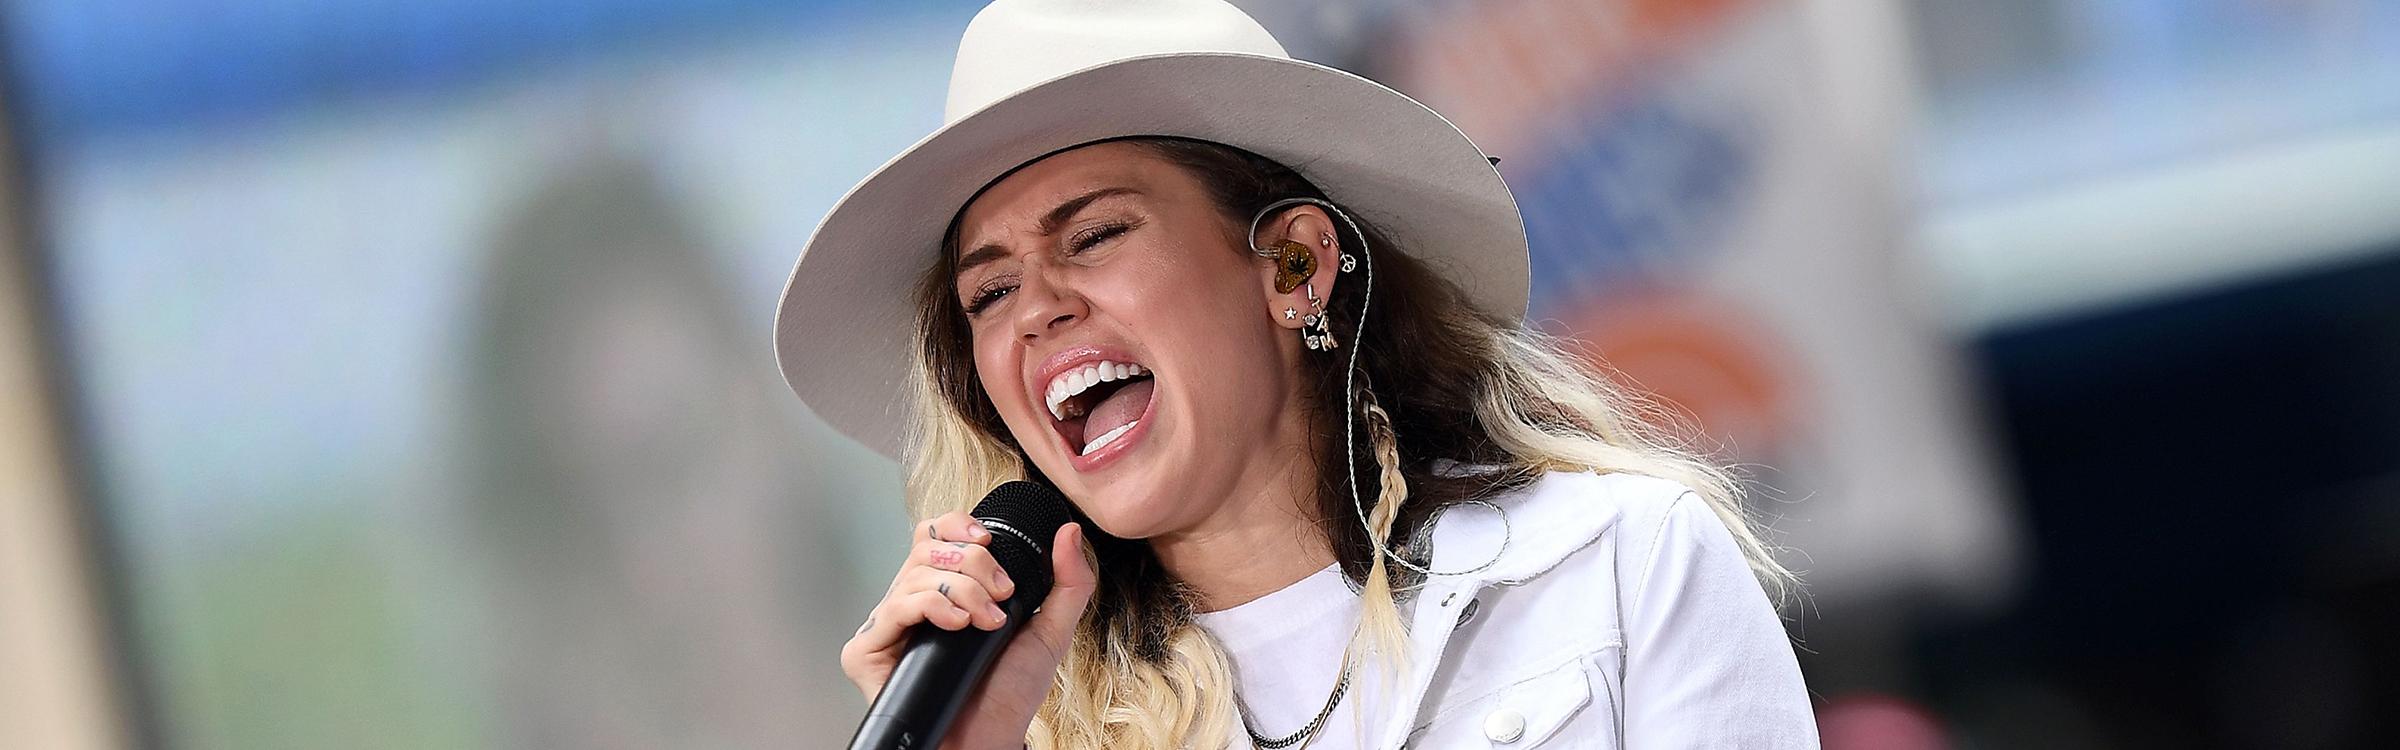 Miley headeraf